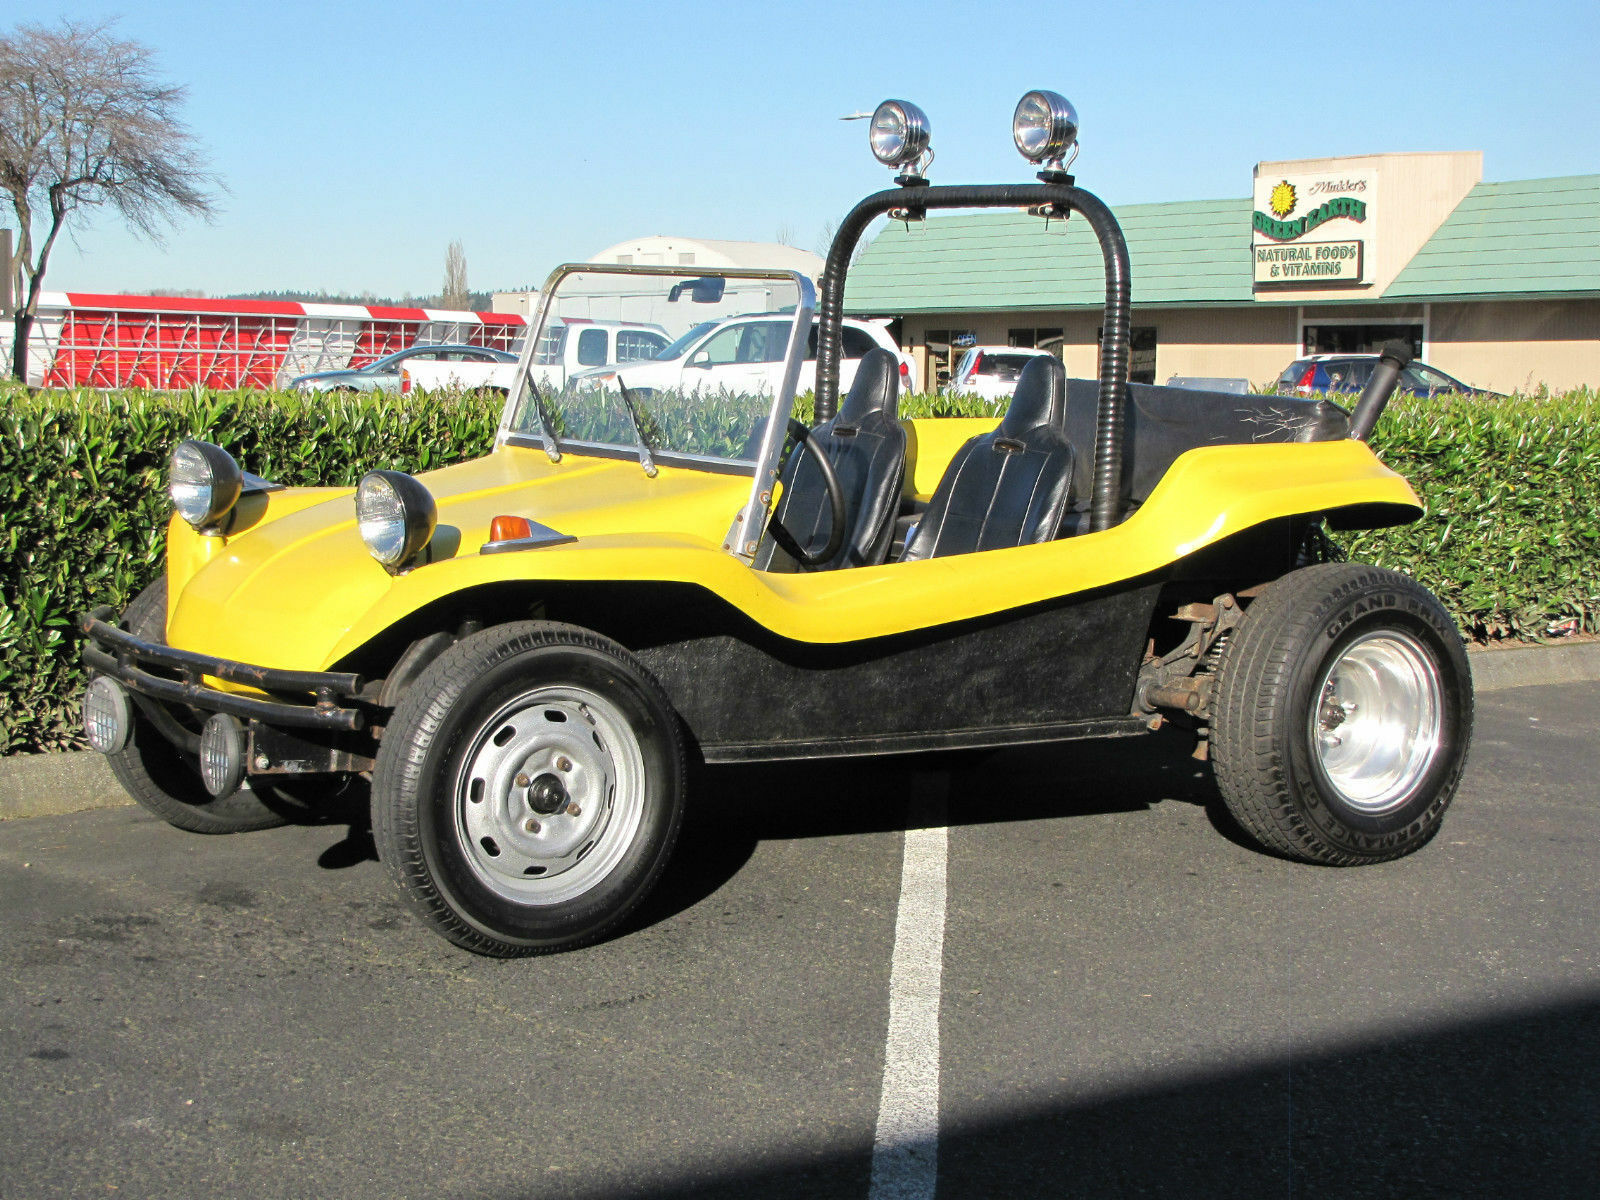 Manx Buggy Kit Ontario Active School Travel Meyers Wiring Diagram Top 10 Cars Ebay